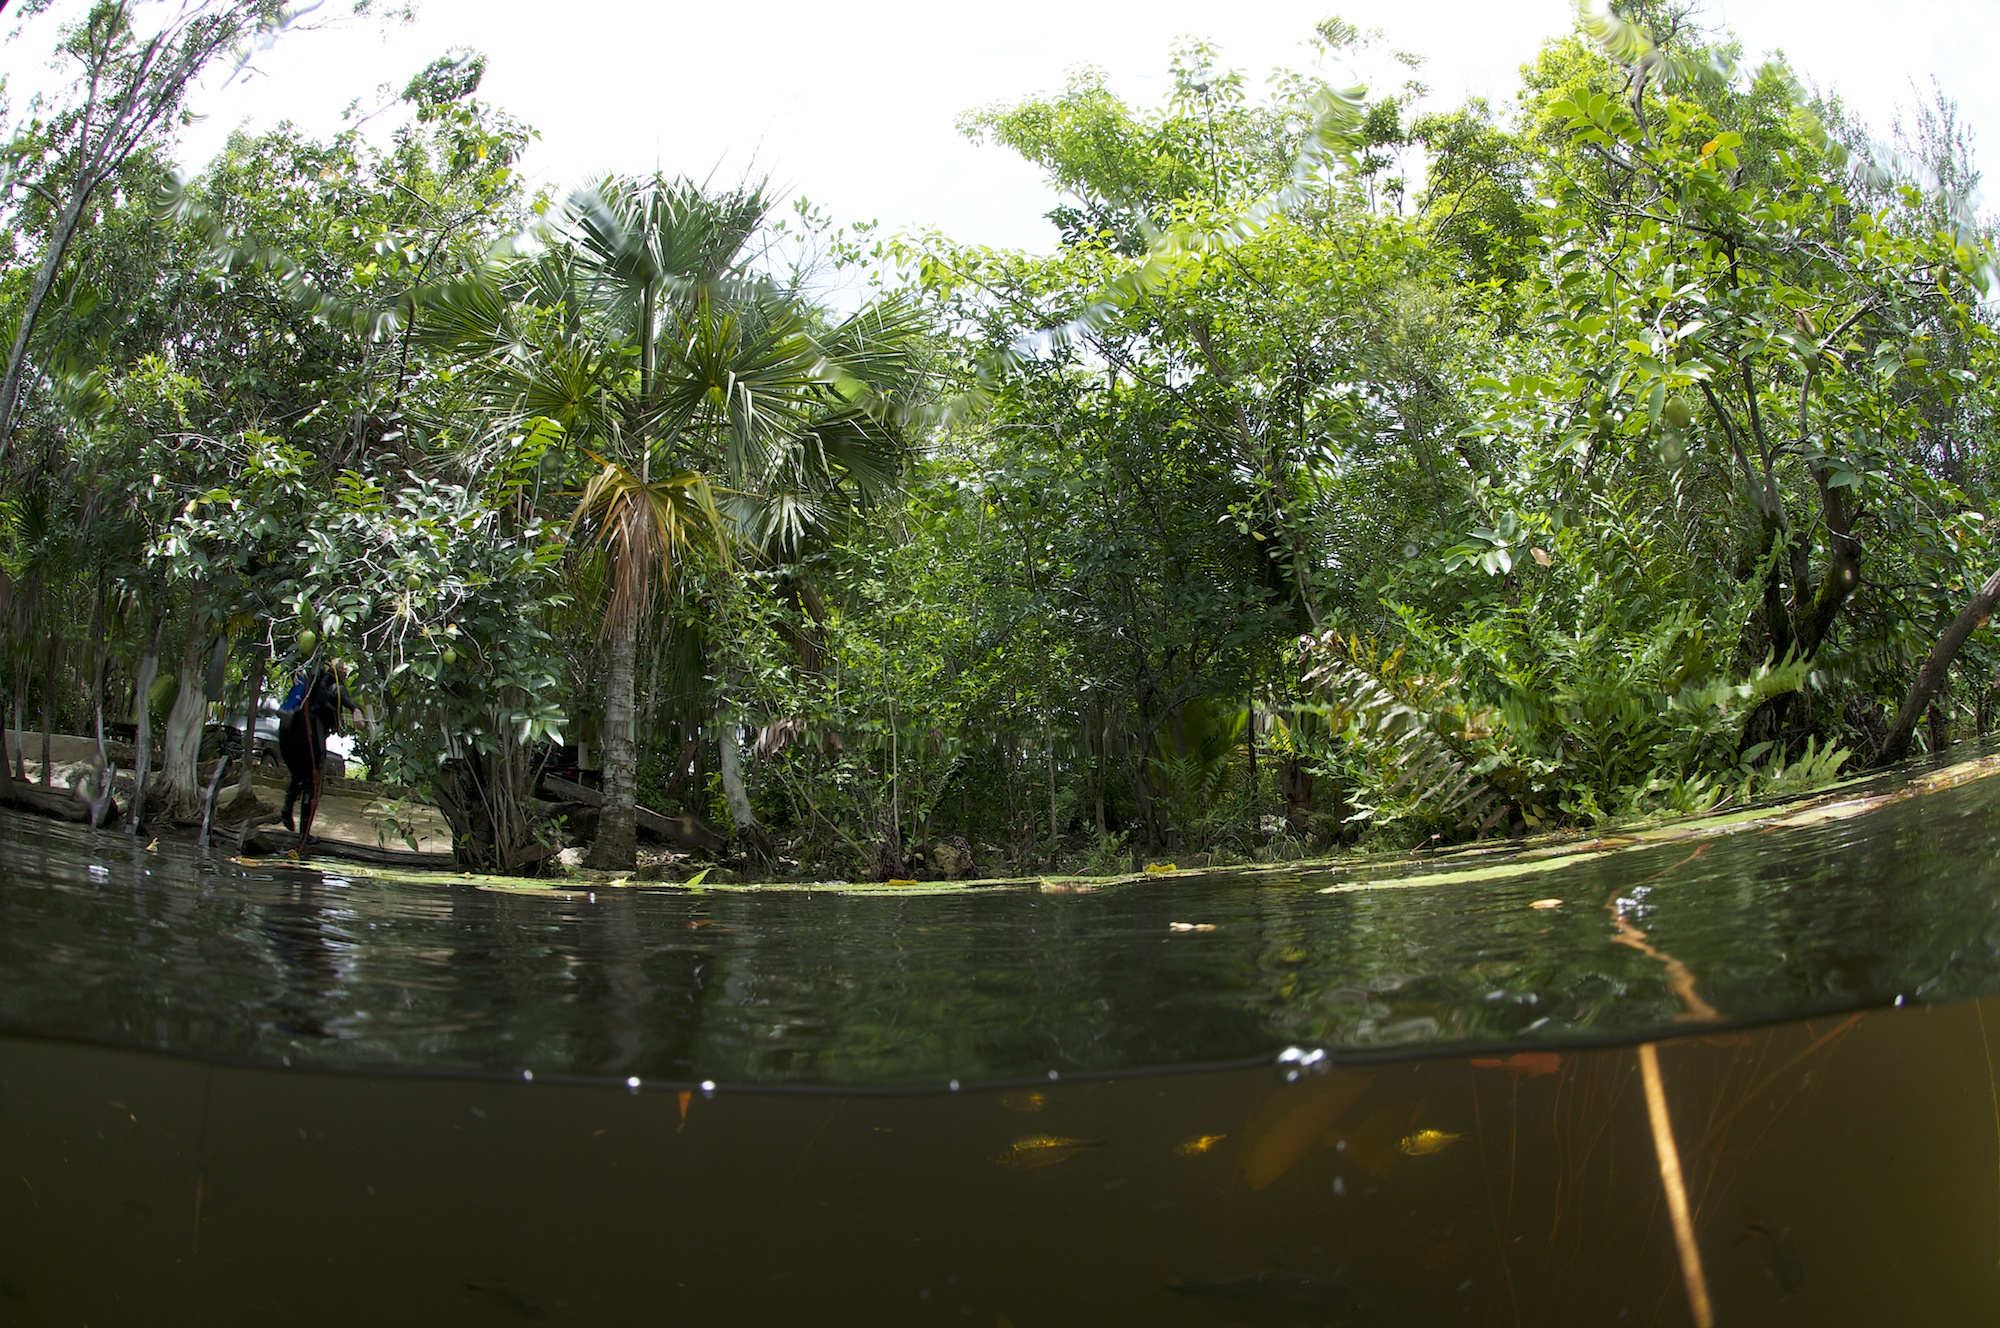 Car Wash Cenotes, Yucatan, Mexico